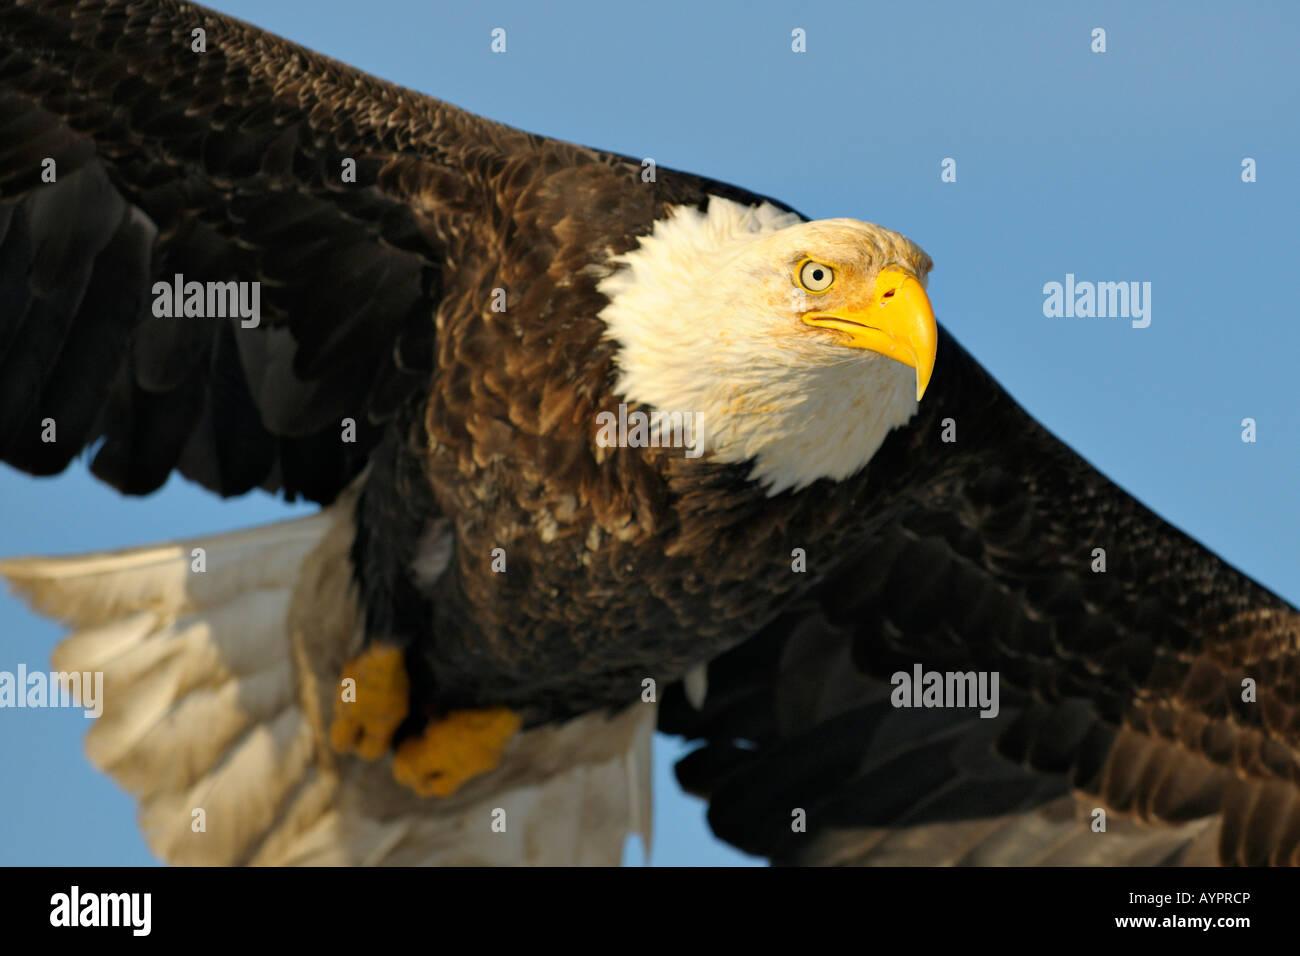 Bald Eagle (Haliaeetus leucocephalus) in flight, Kenai Peninsula, Alaska, USA - Stock Image